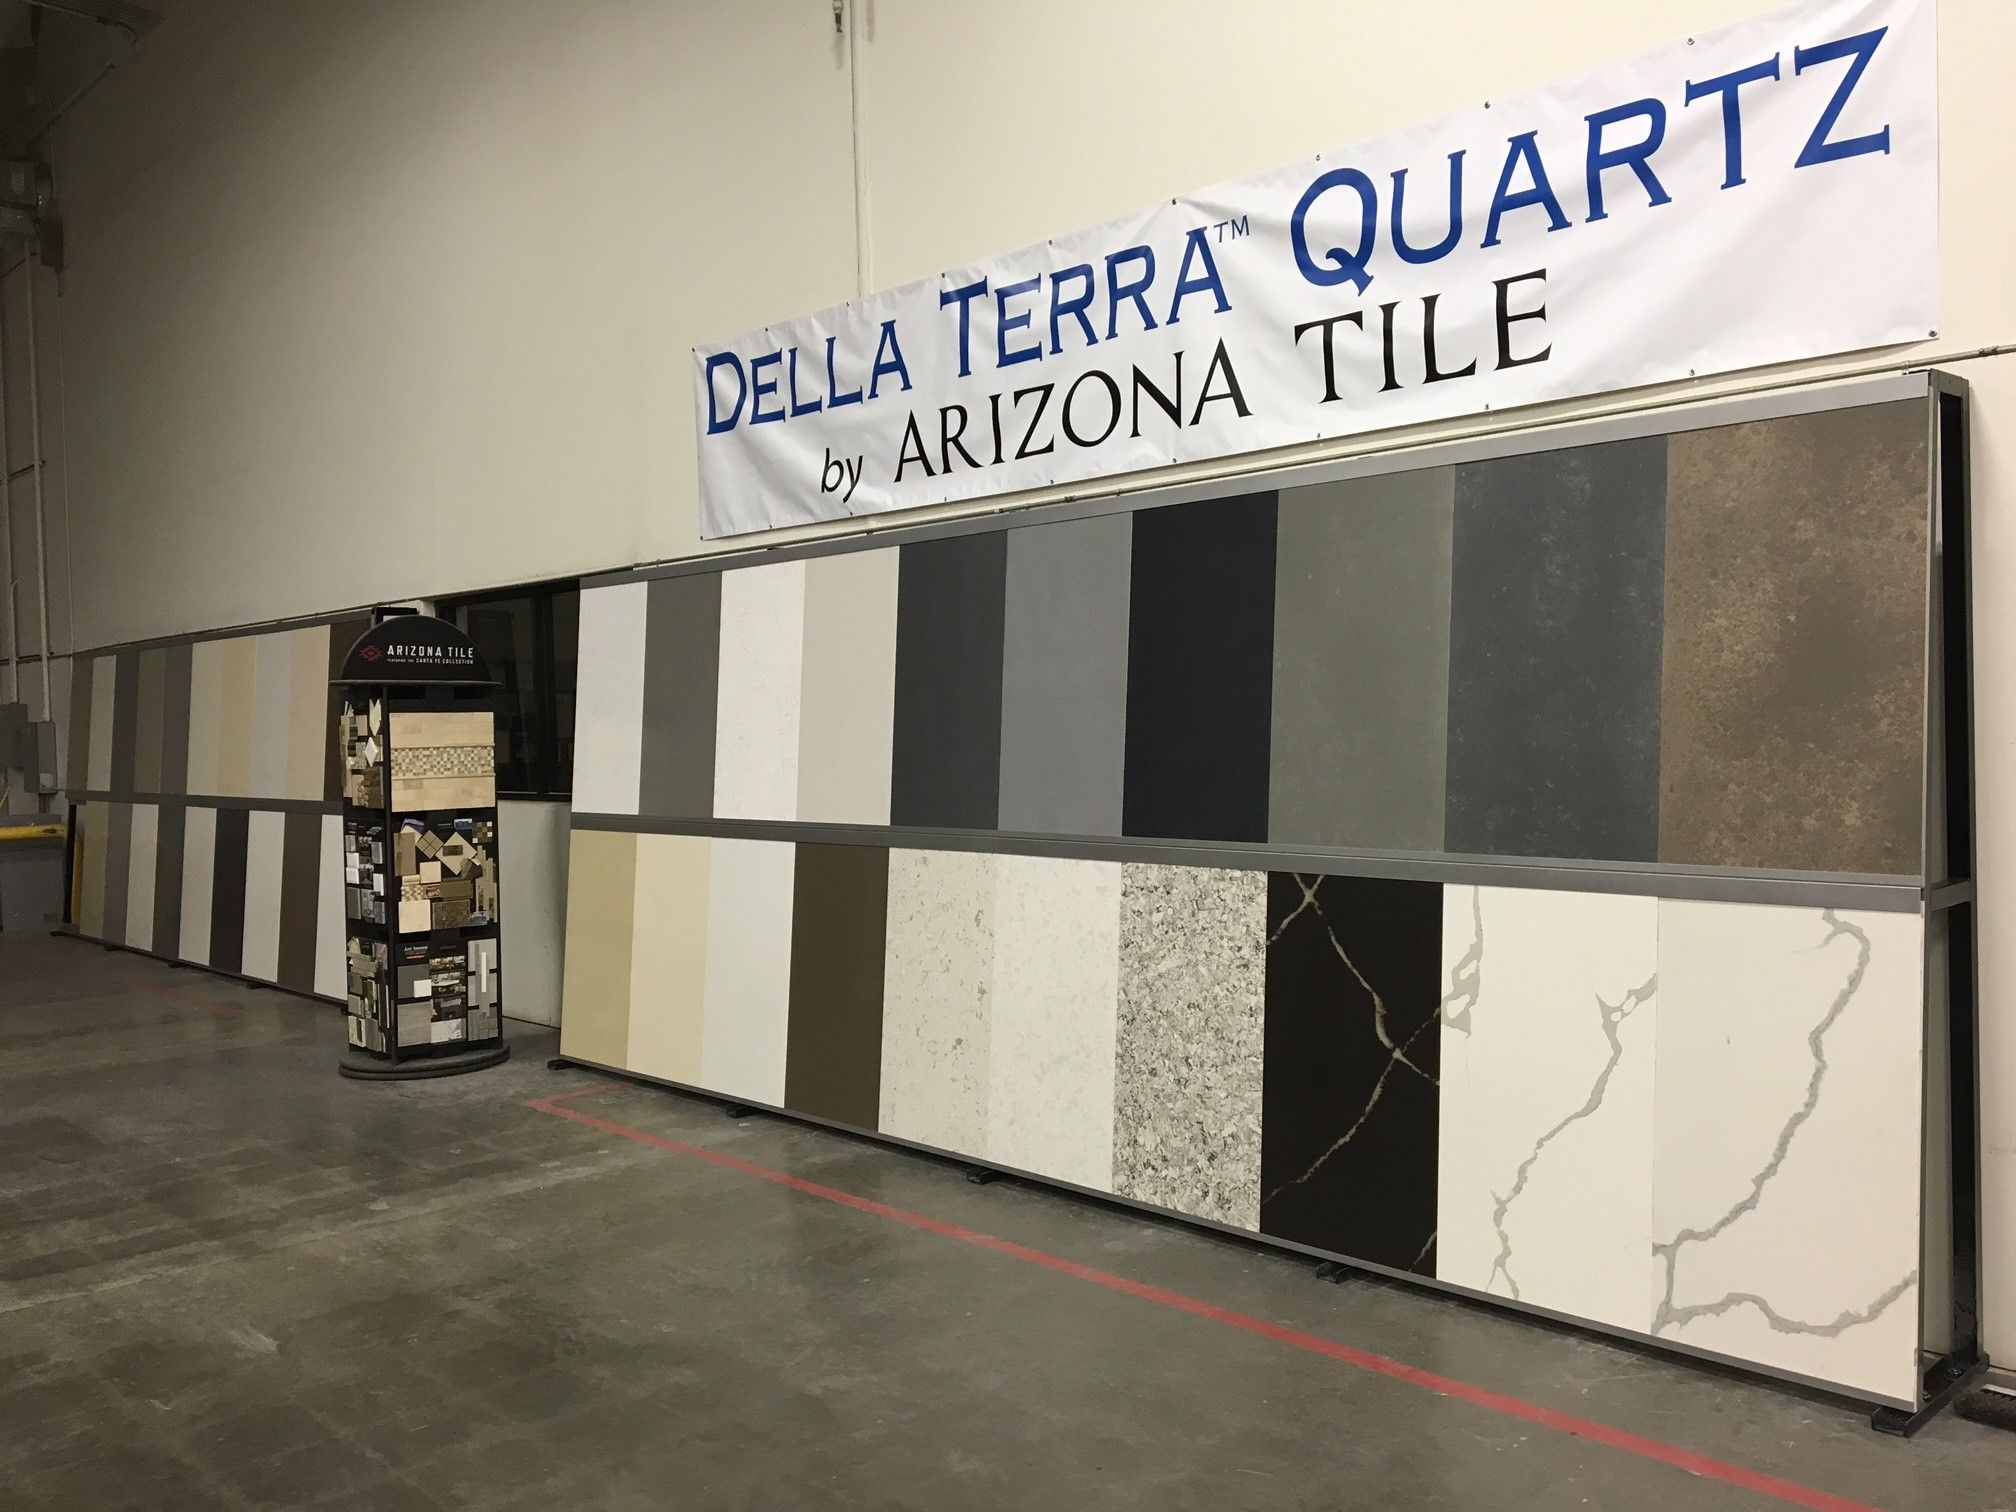 Need Help Selecting Quartz Slabs For Your Upcoming Project Della Terra Quartz Is Waiting For You Stocked In Almo Quartz Countertops Quartz Slab Countertops